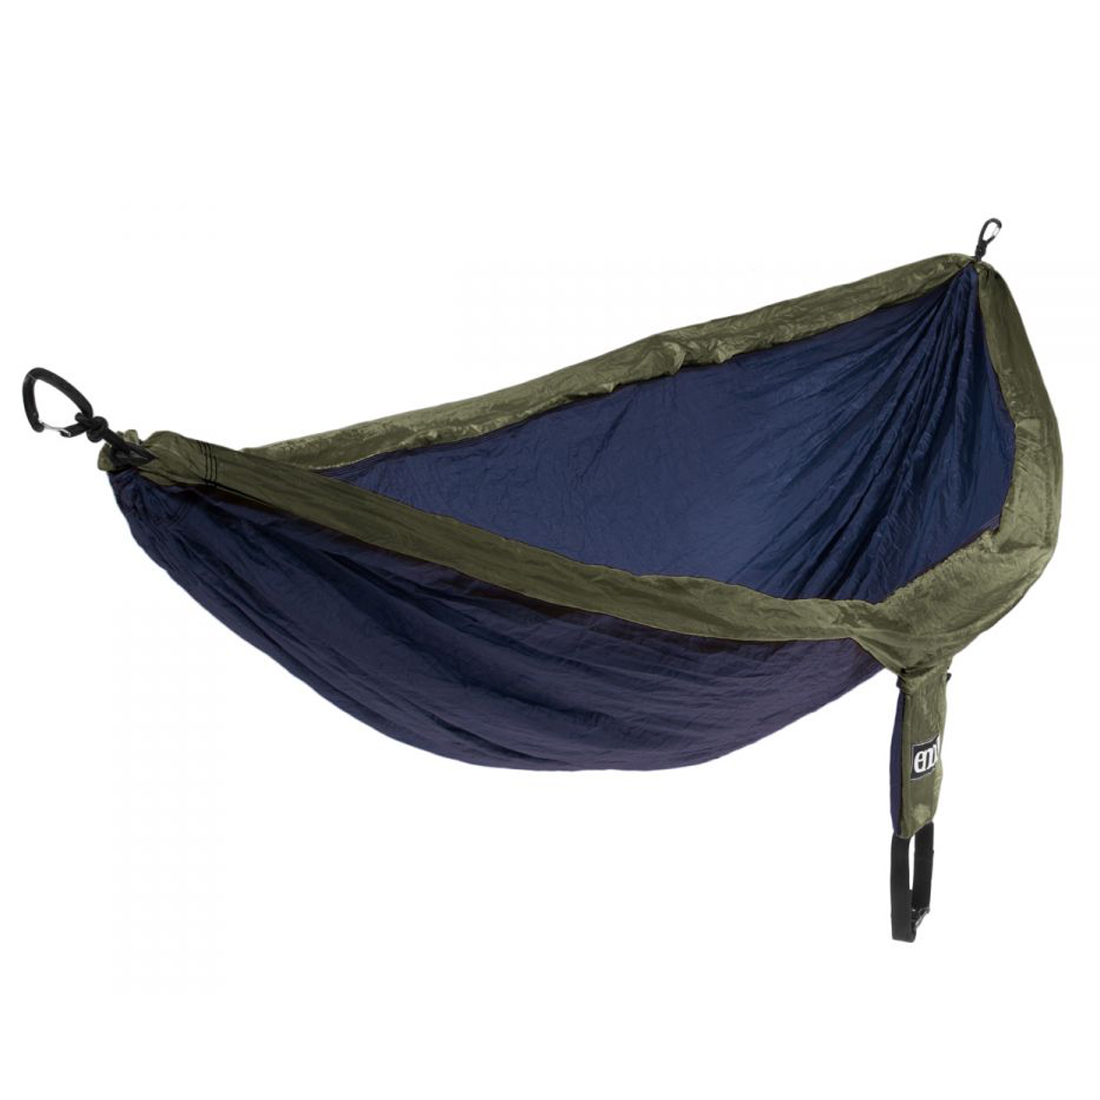 eno double nest hammock navy olive with indoor hanging kit. Black Bedroom Furniture Sets. Home Design Ideas